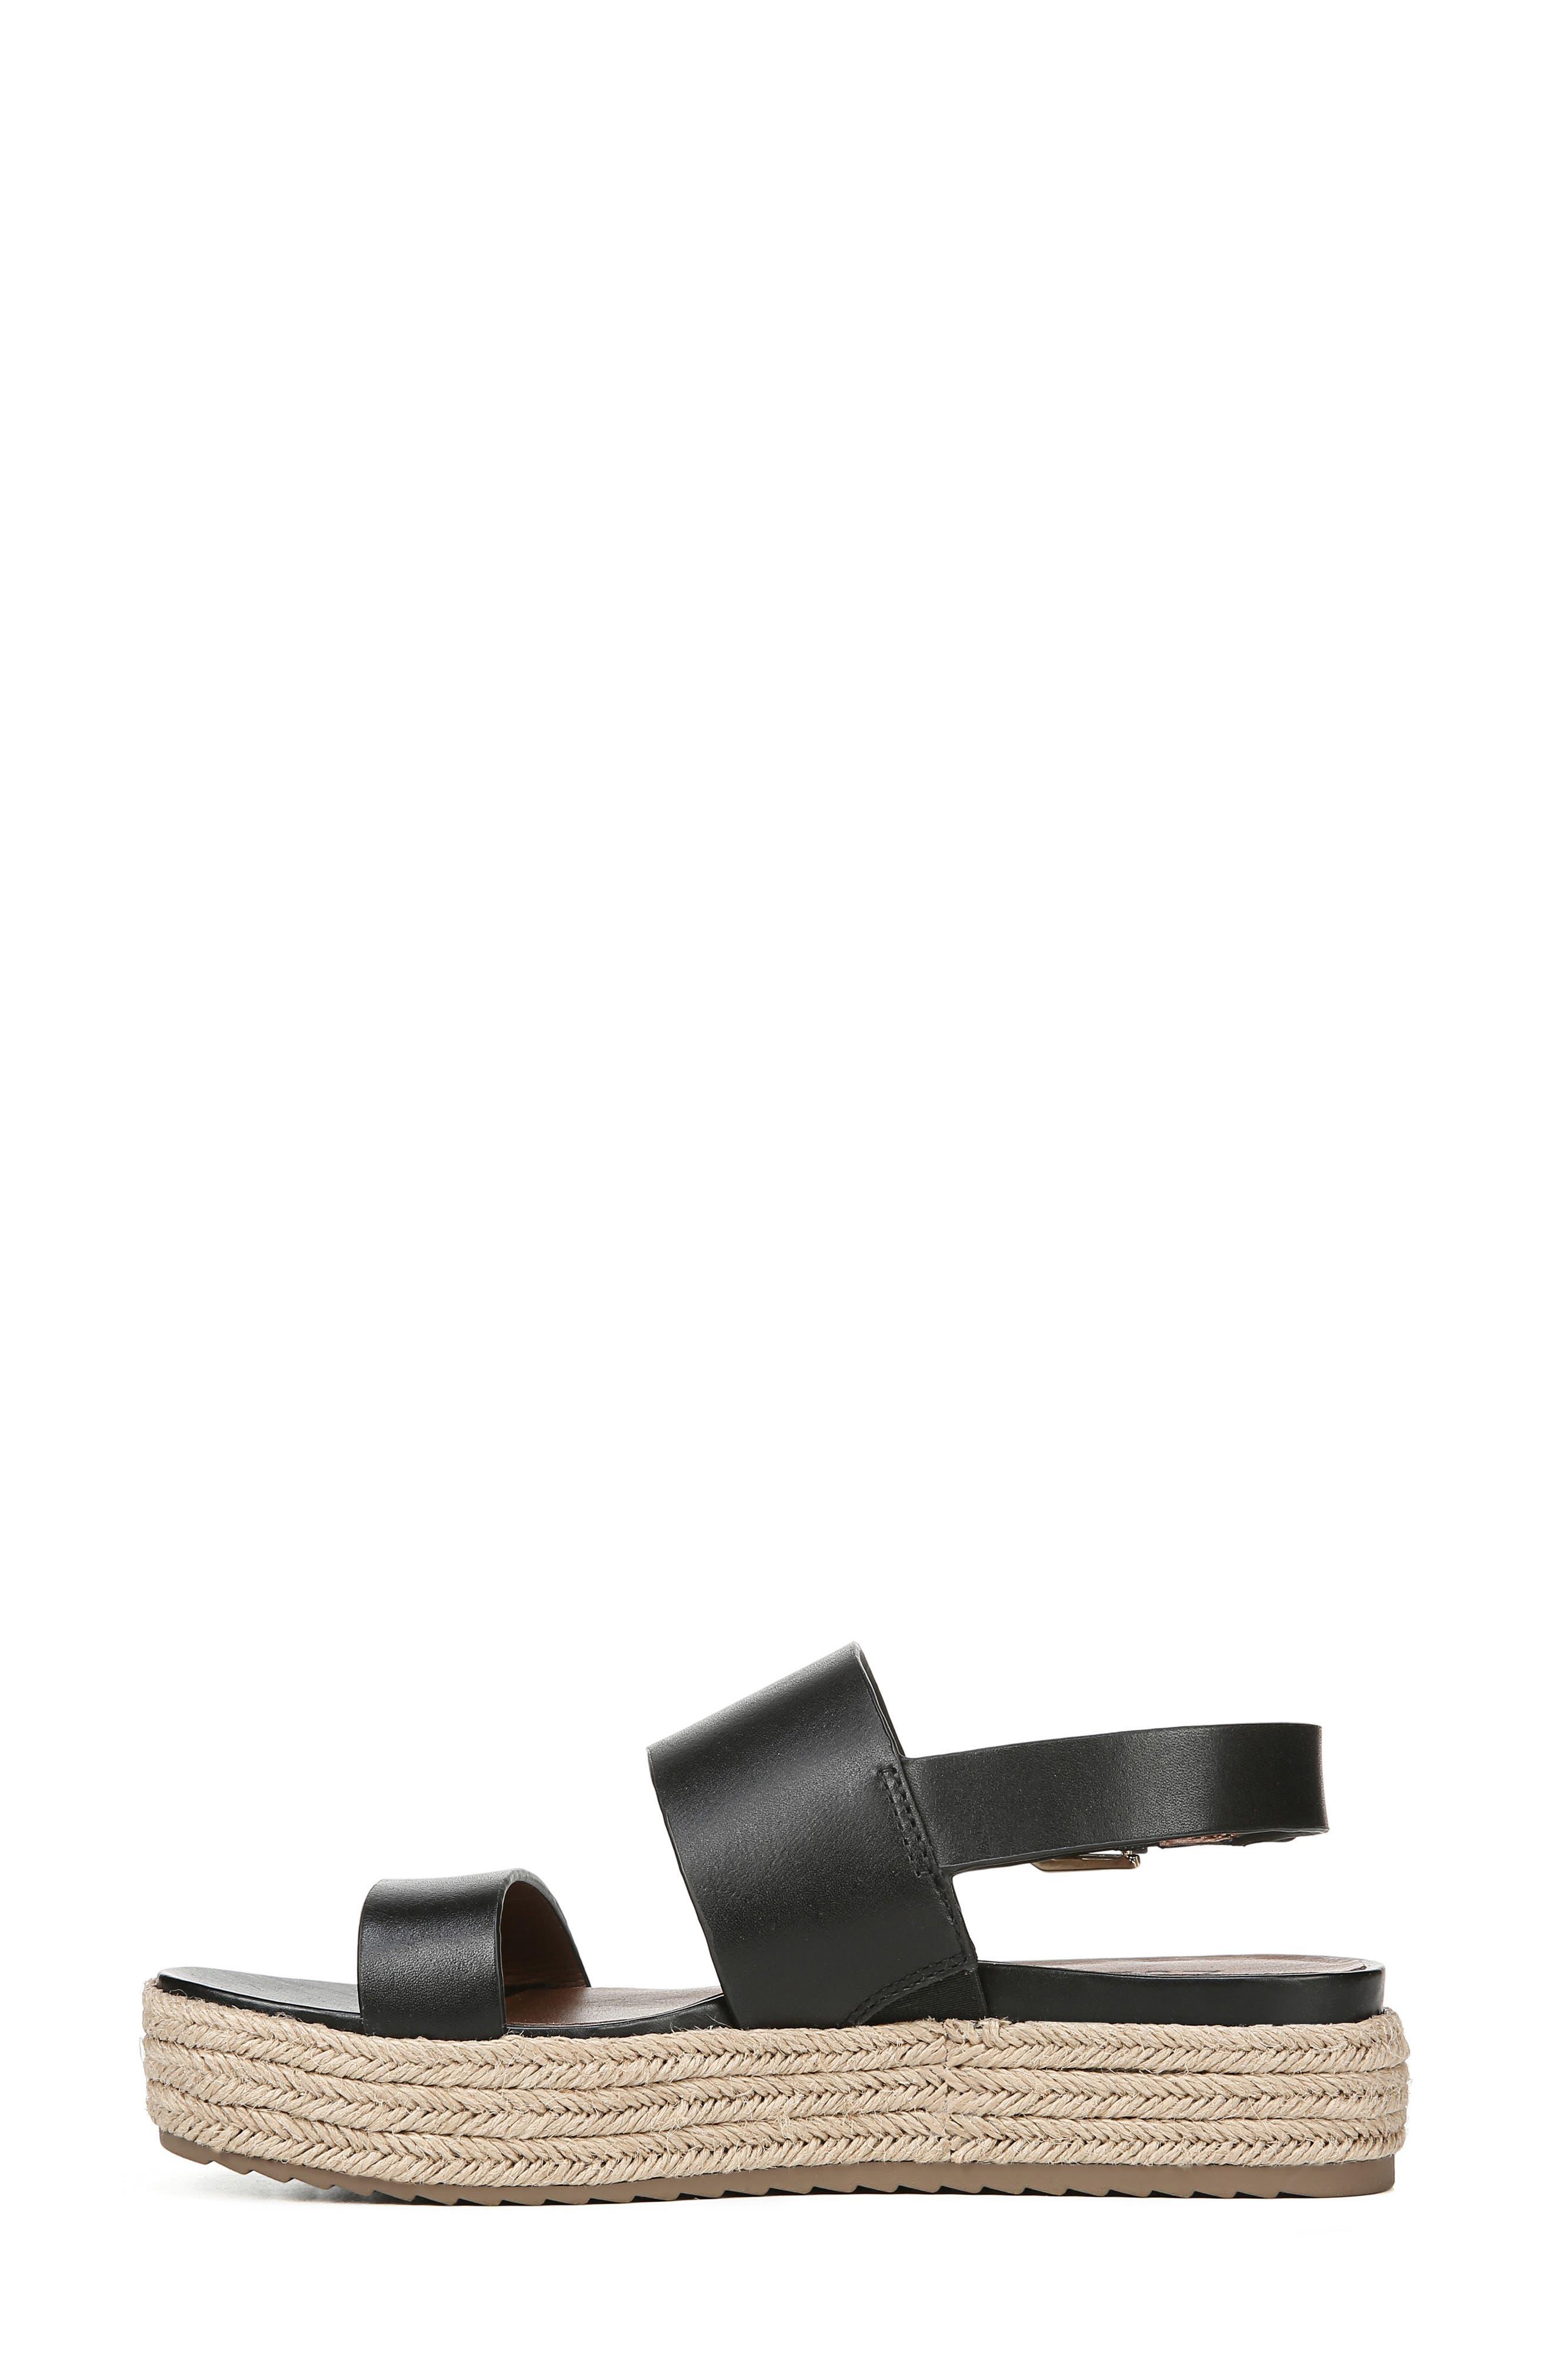 NATURALIZER, Jaycie Platform Sandal, Alternate thumbnail 8, color, BLACK LEATHER